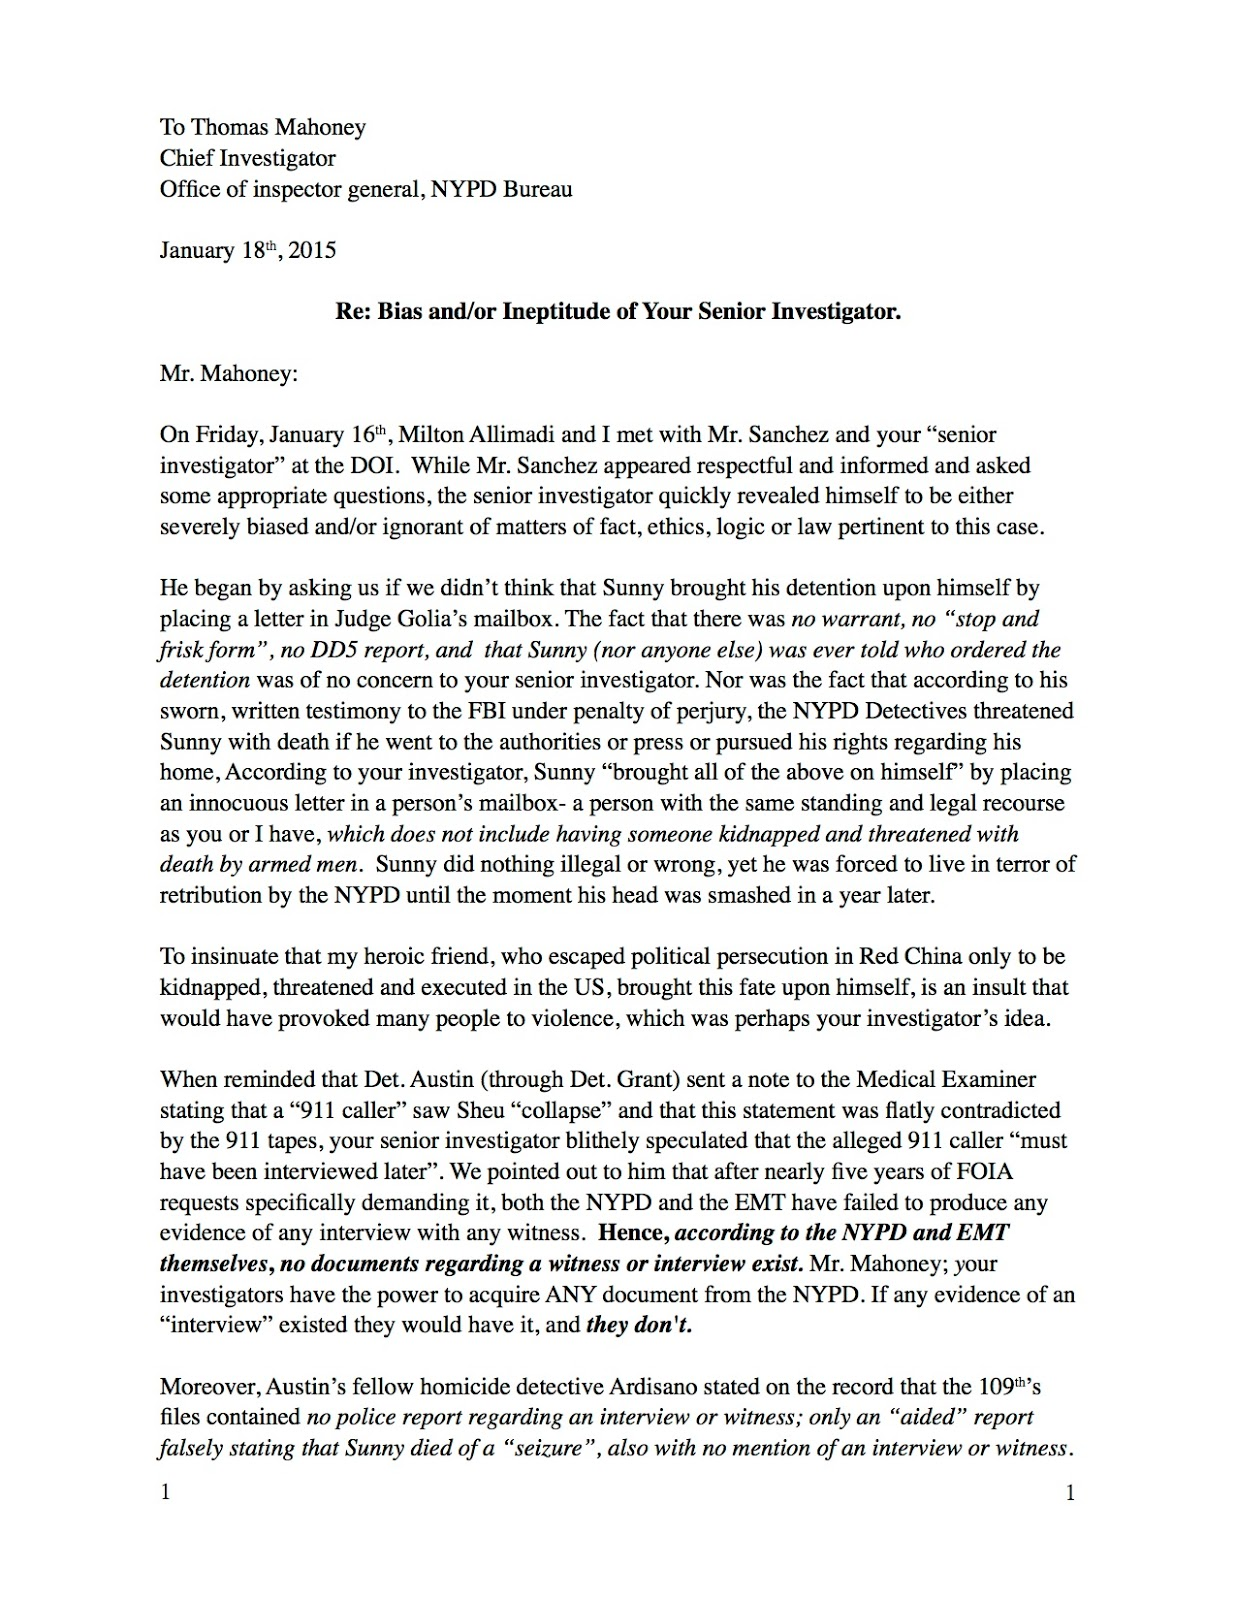 the murder of sunny sheu chief investigator thomas mahoney no response from mahoney